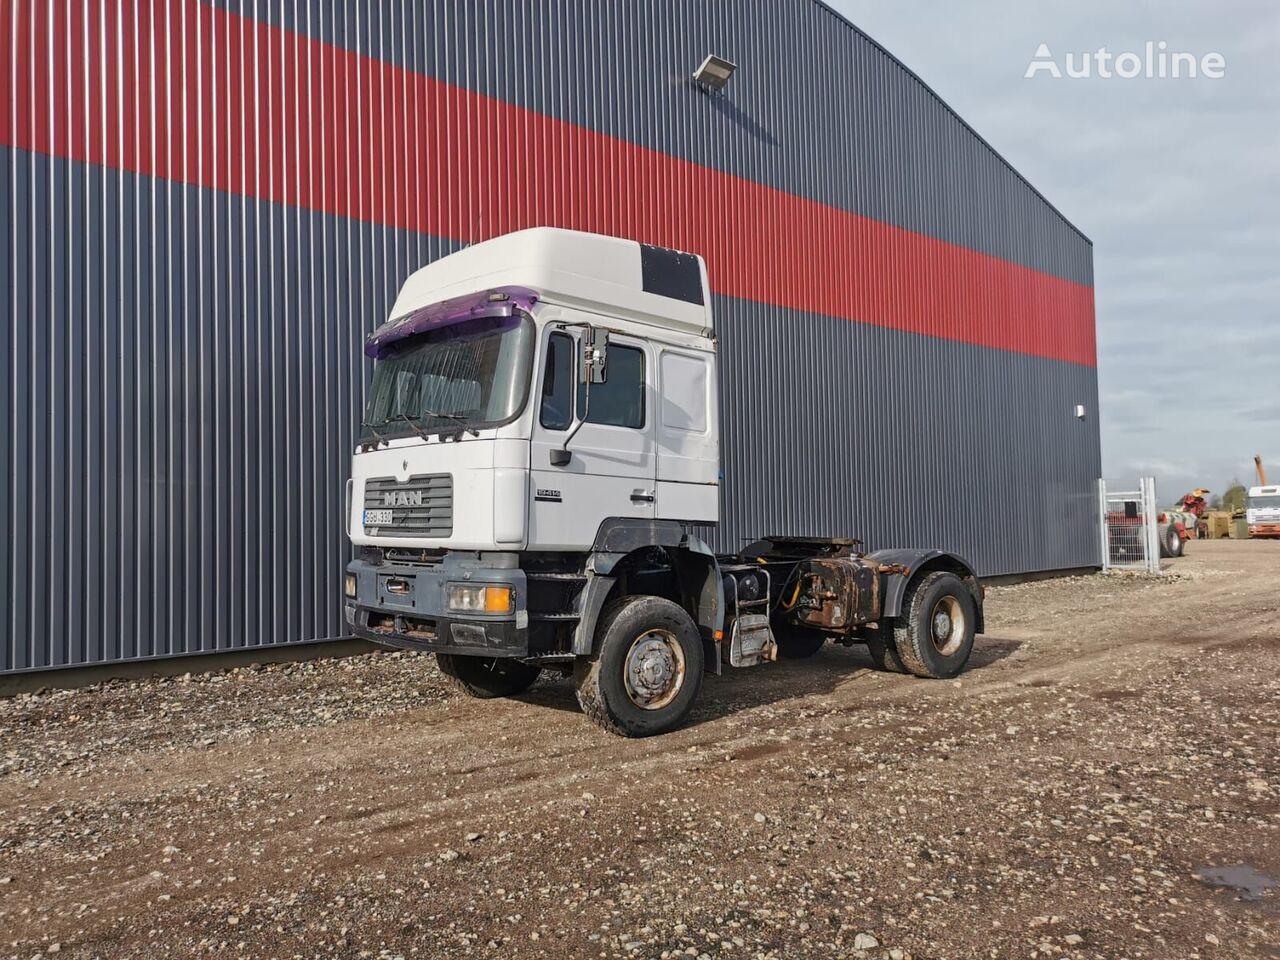 MAN 19.414, 4x4 tractor unit